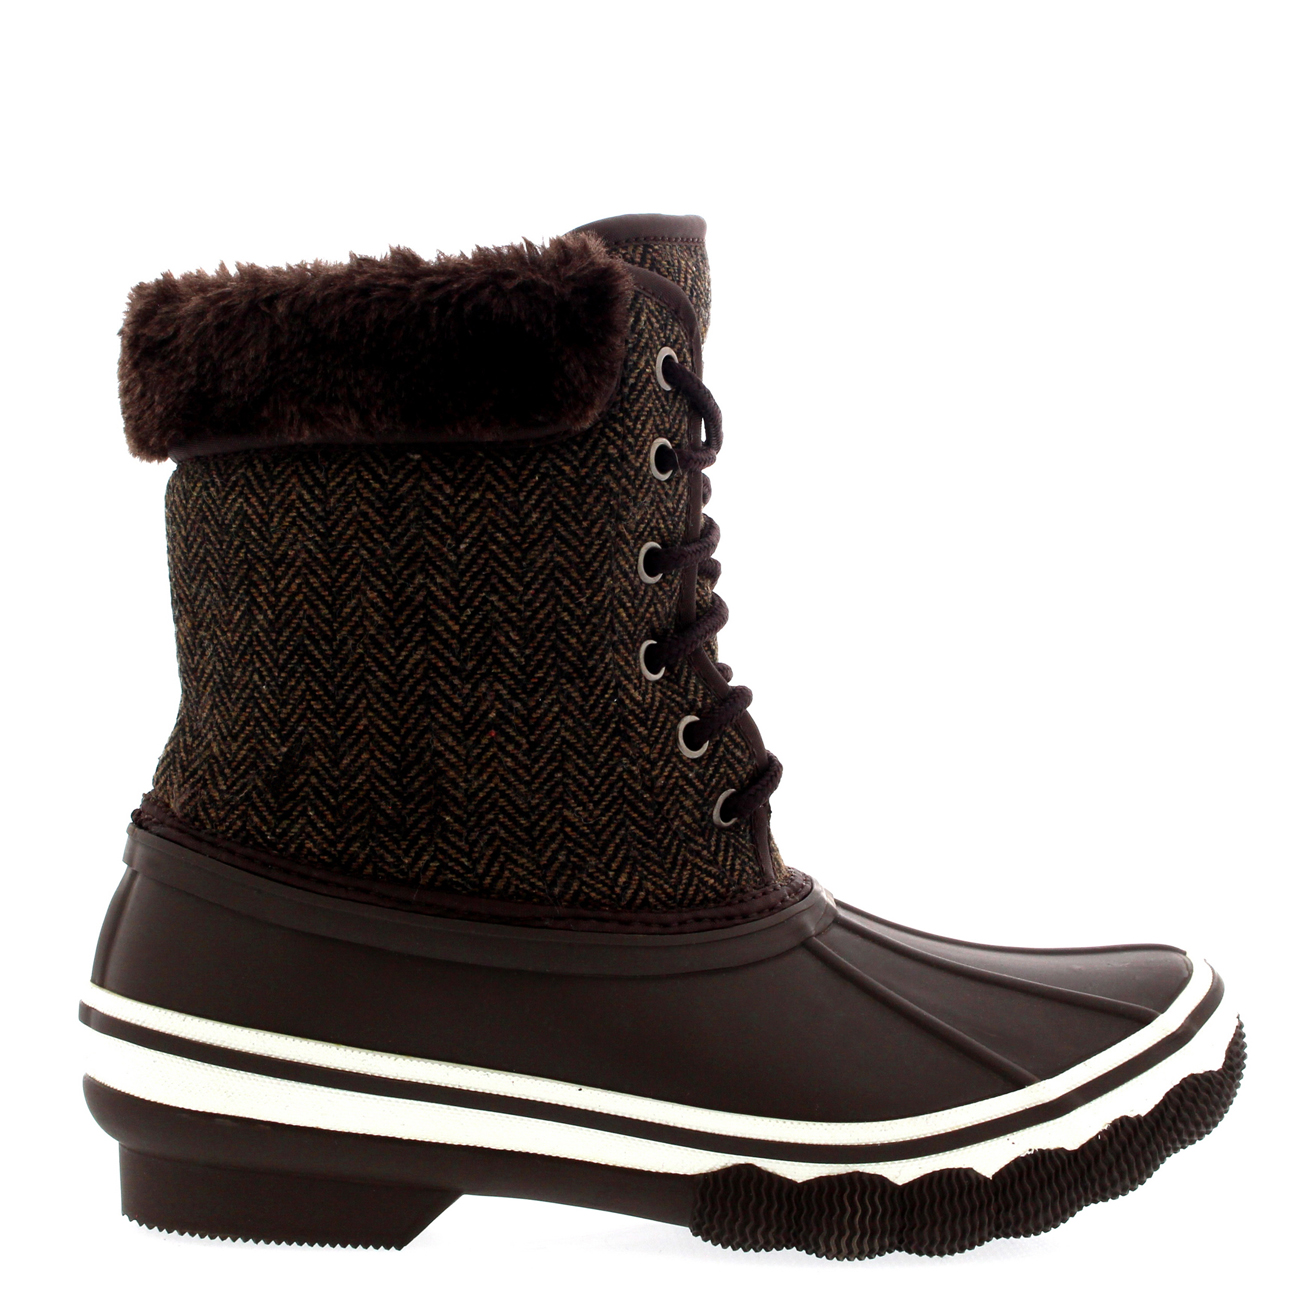 Womens Rubber Sole Deep Tread Winter Textile Fur Cuff Snow